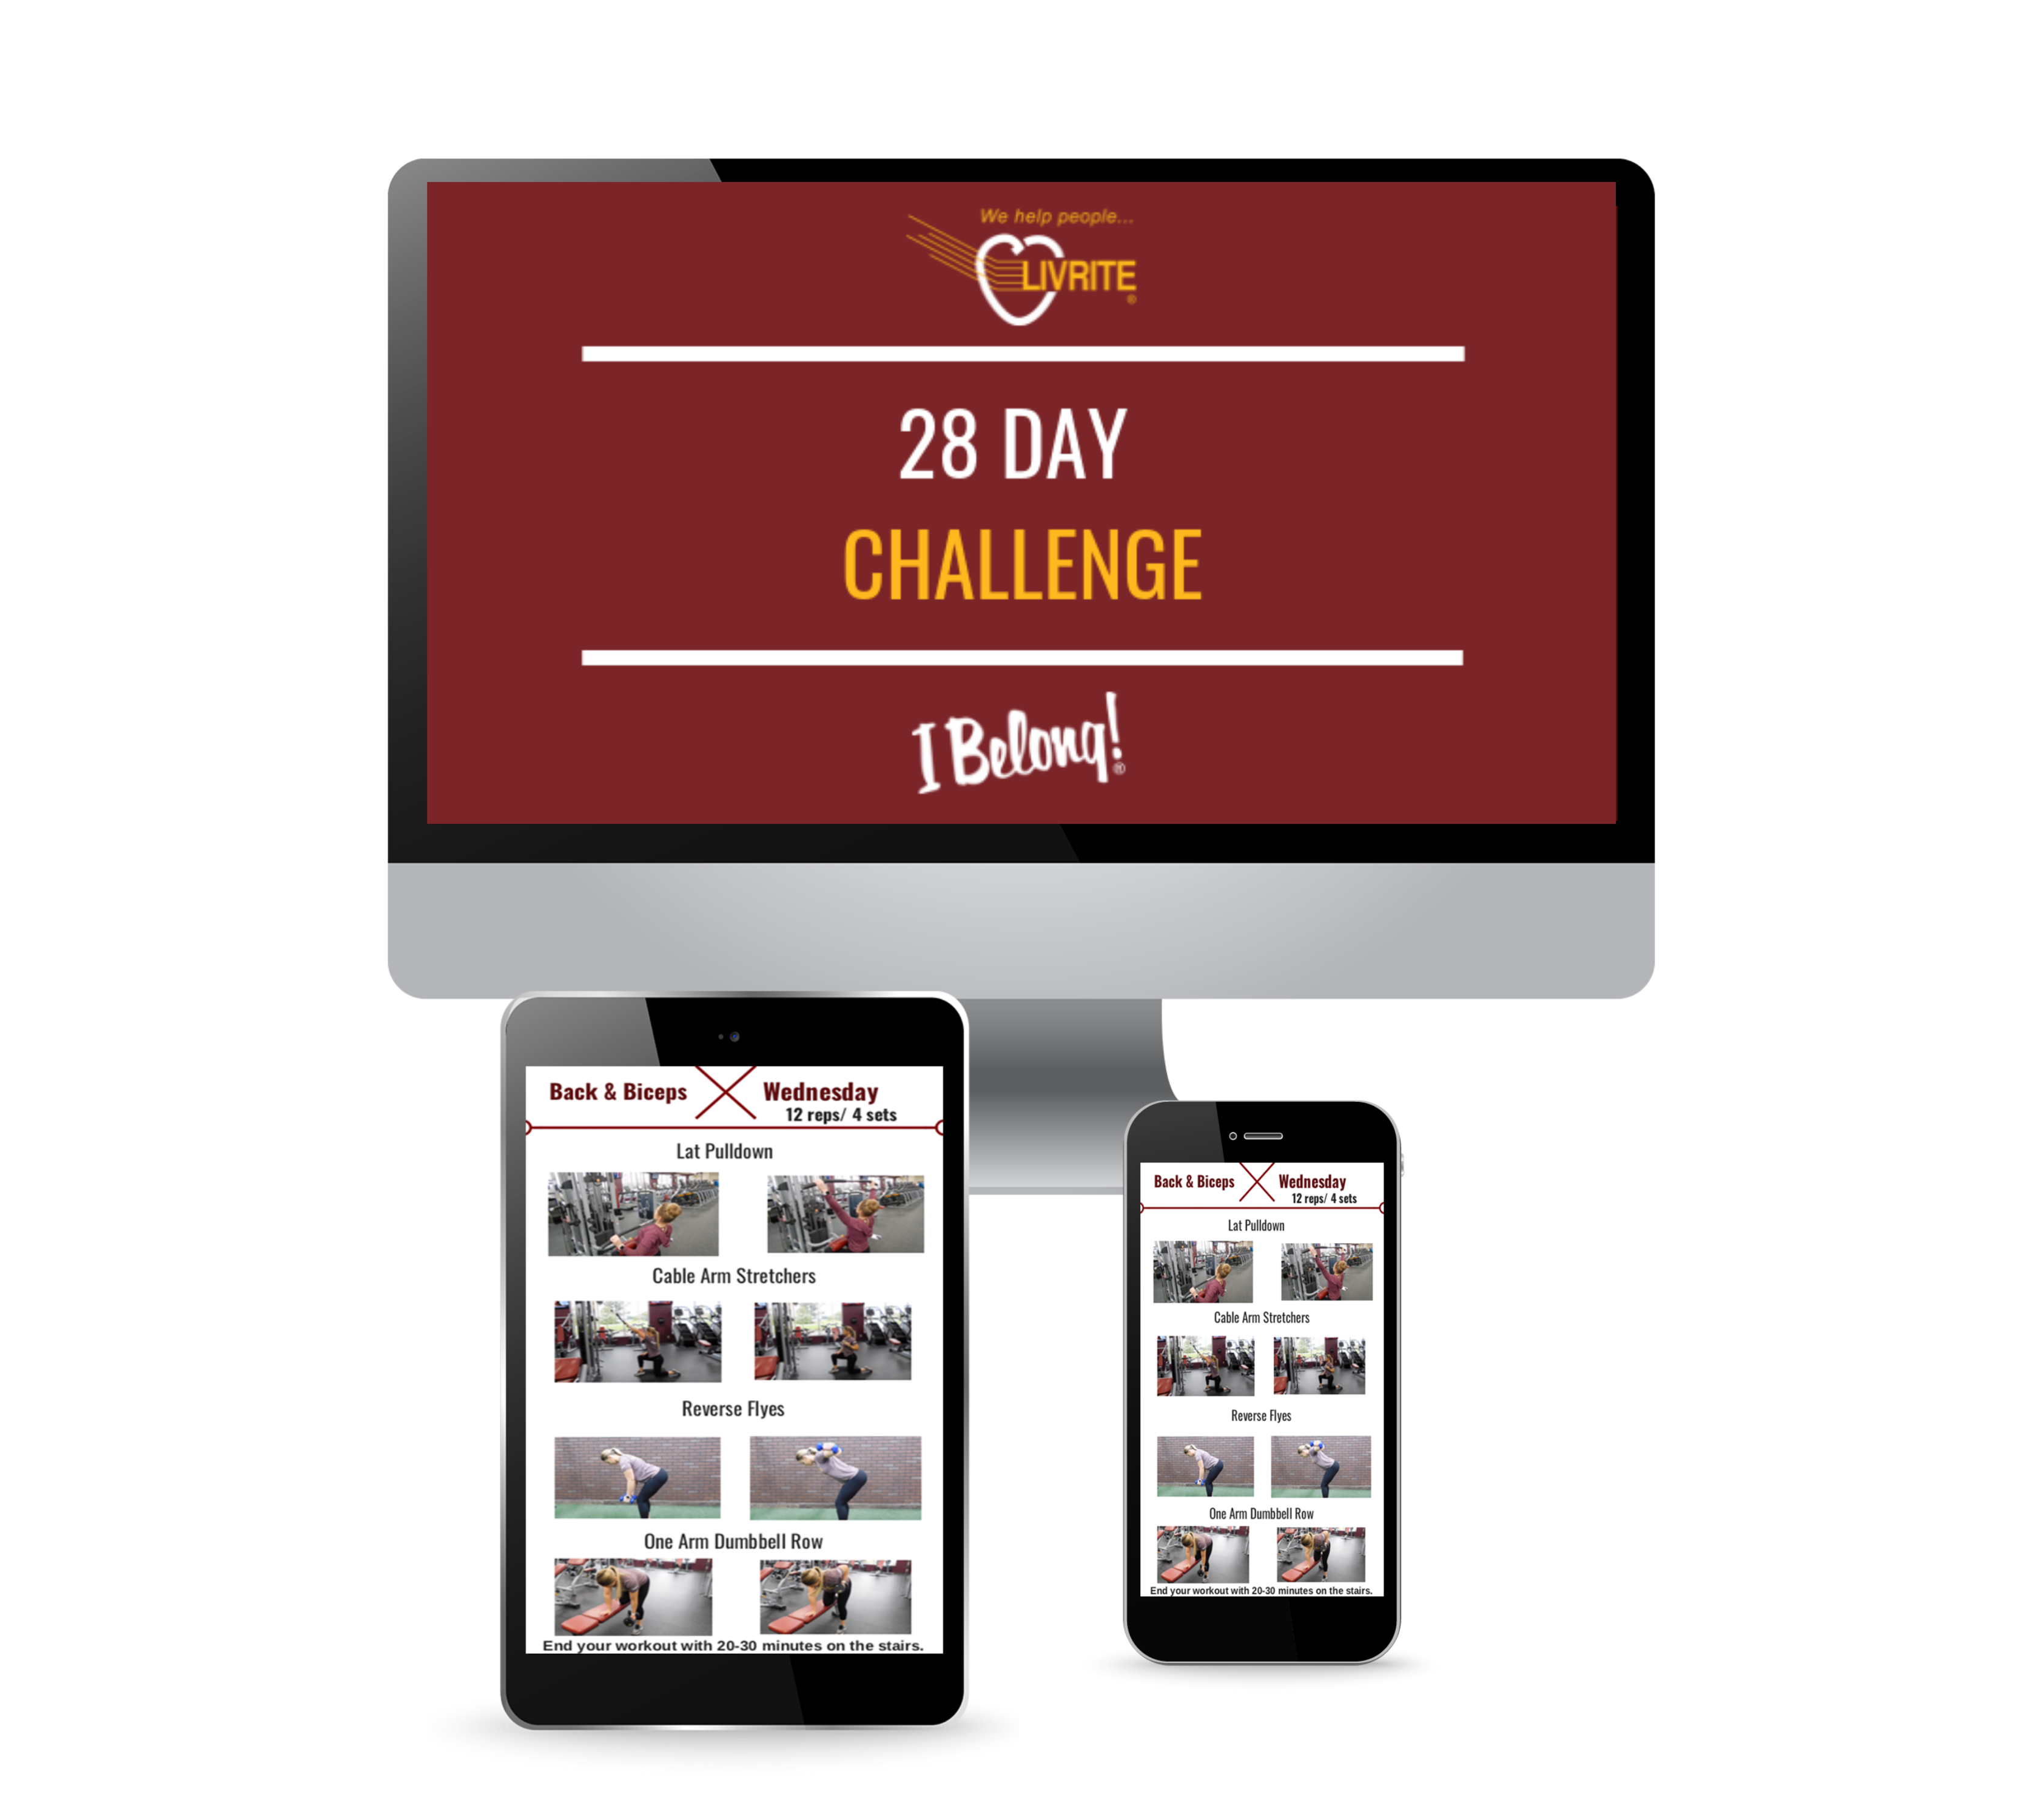 28 day challenge Ipad, Imac, iphone